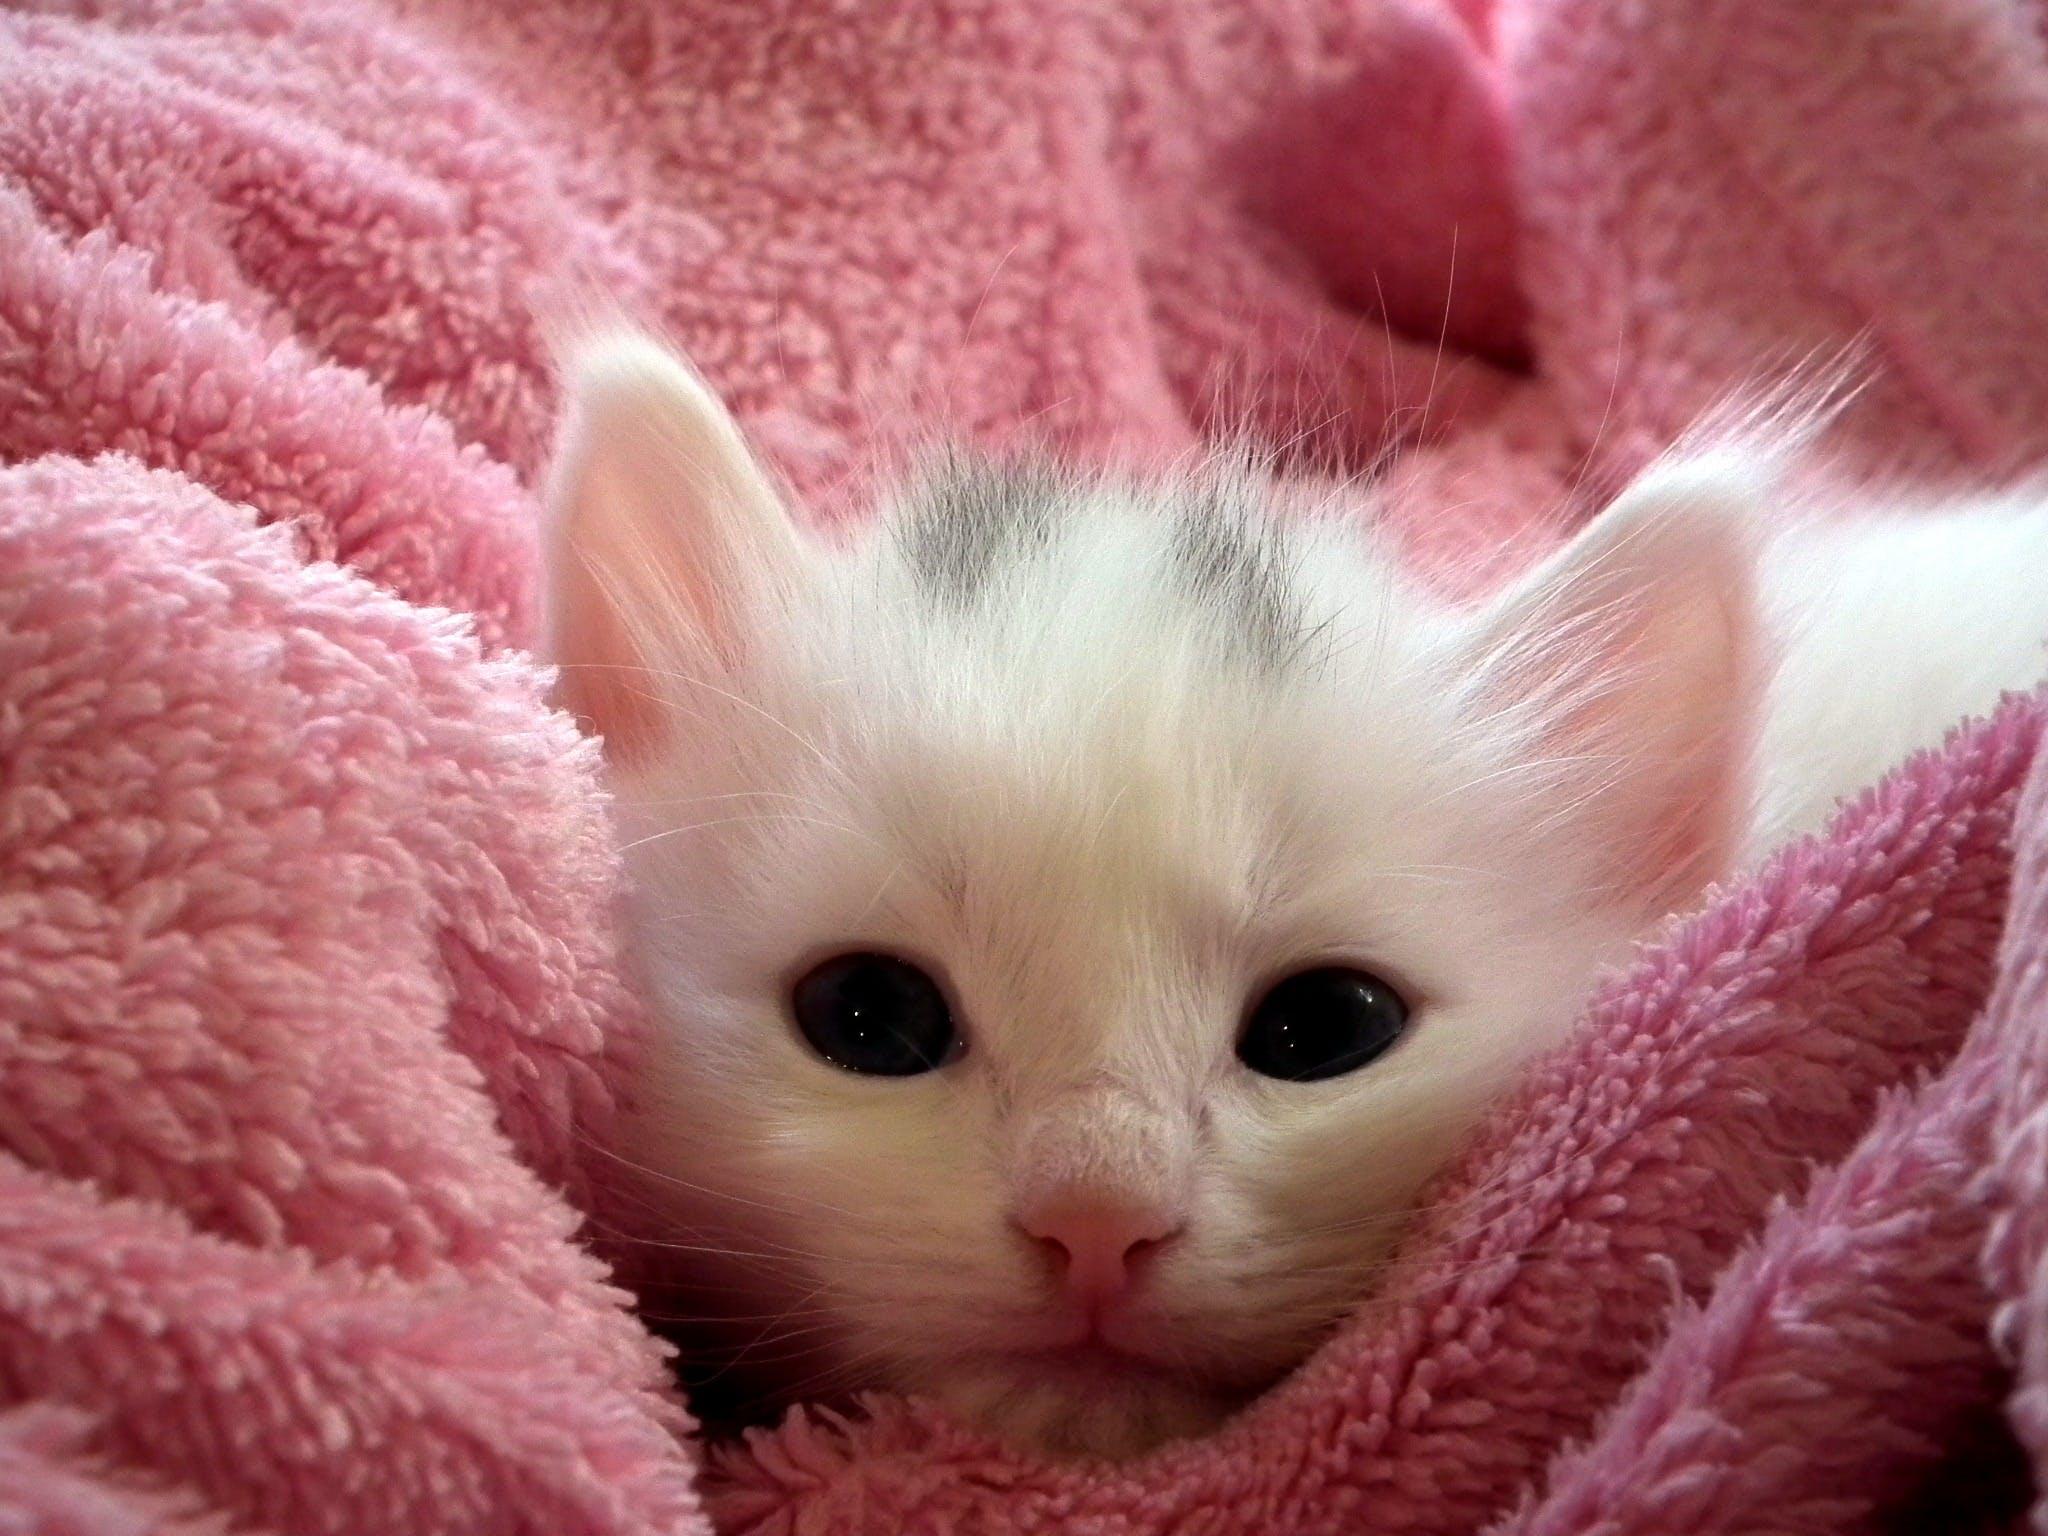 Kostenloses Stock Foto zu decke, haustier, kätzchen, katze